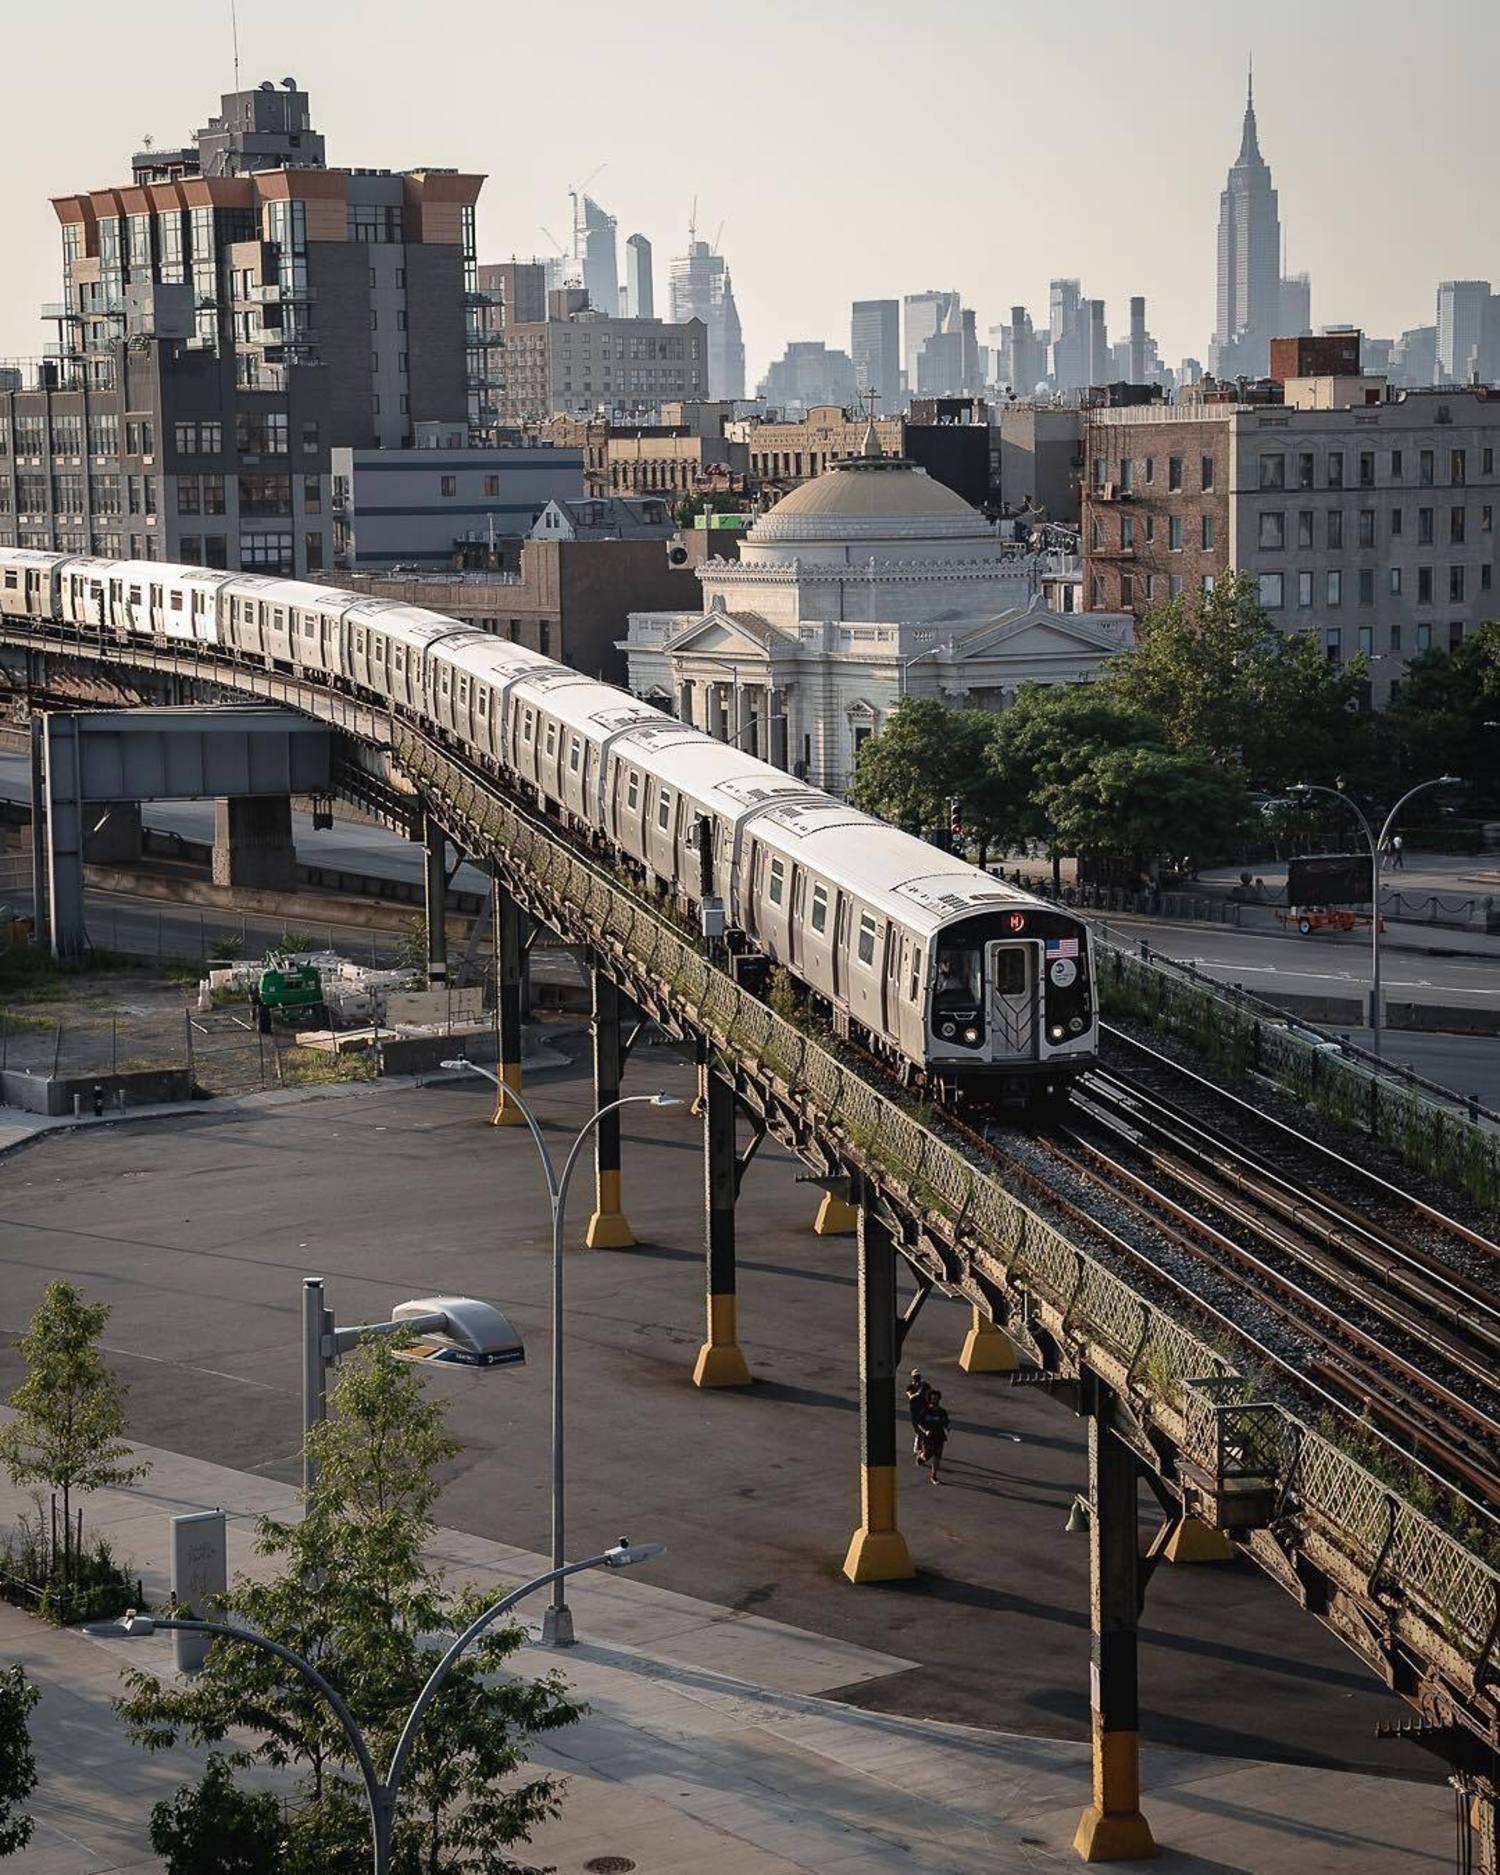 Brooklyn, New York. Photo via @ceos_downbeat #viewingnyc #newyork #newyork #nyc